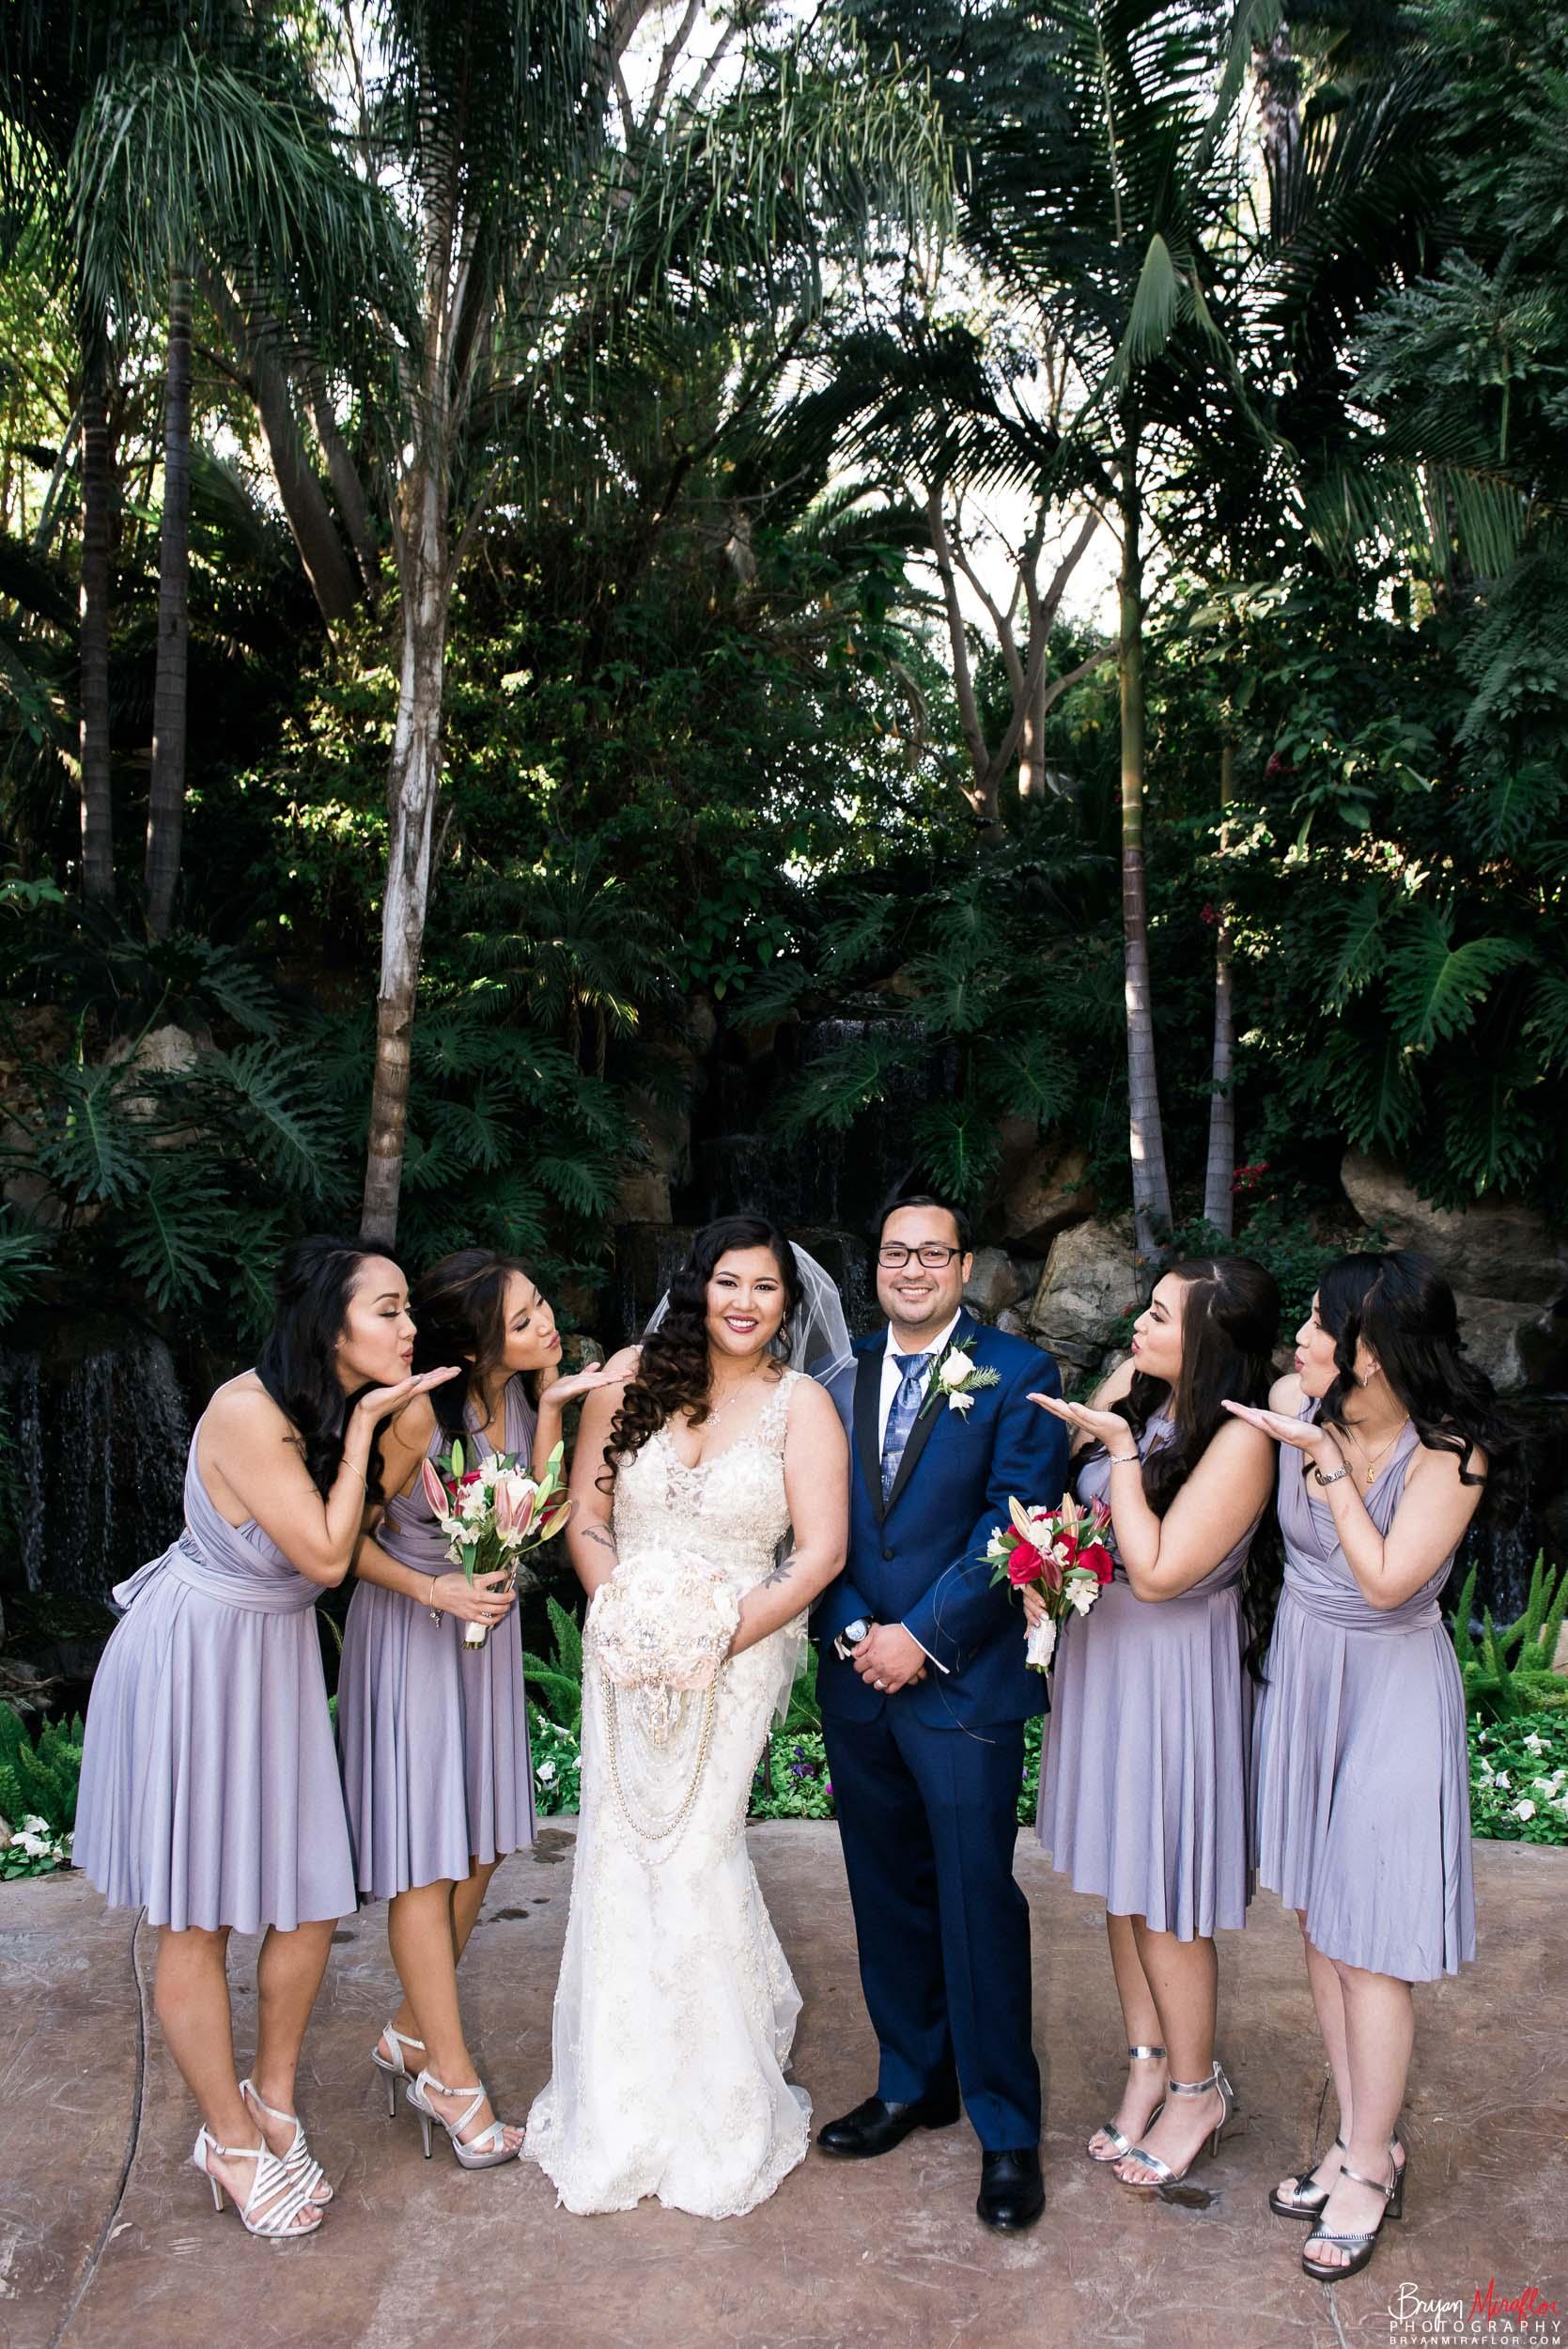 Bryan-Miraflor-Photography-Hannah-Jonathan-Married-Grand-Traditions-Estate-Gardens-Fallbrook-20171222-138.jpg